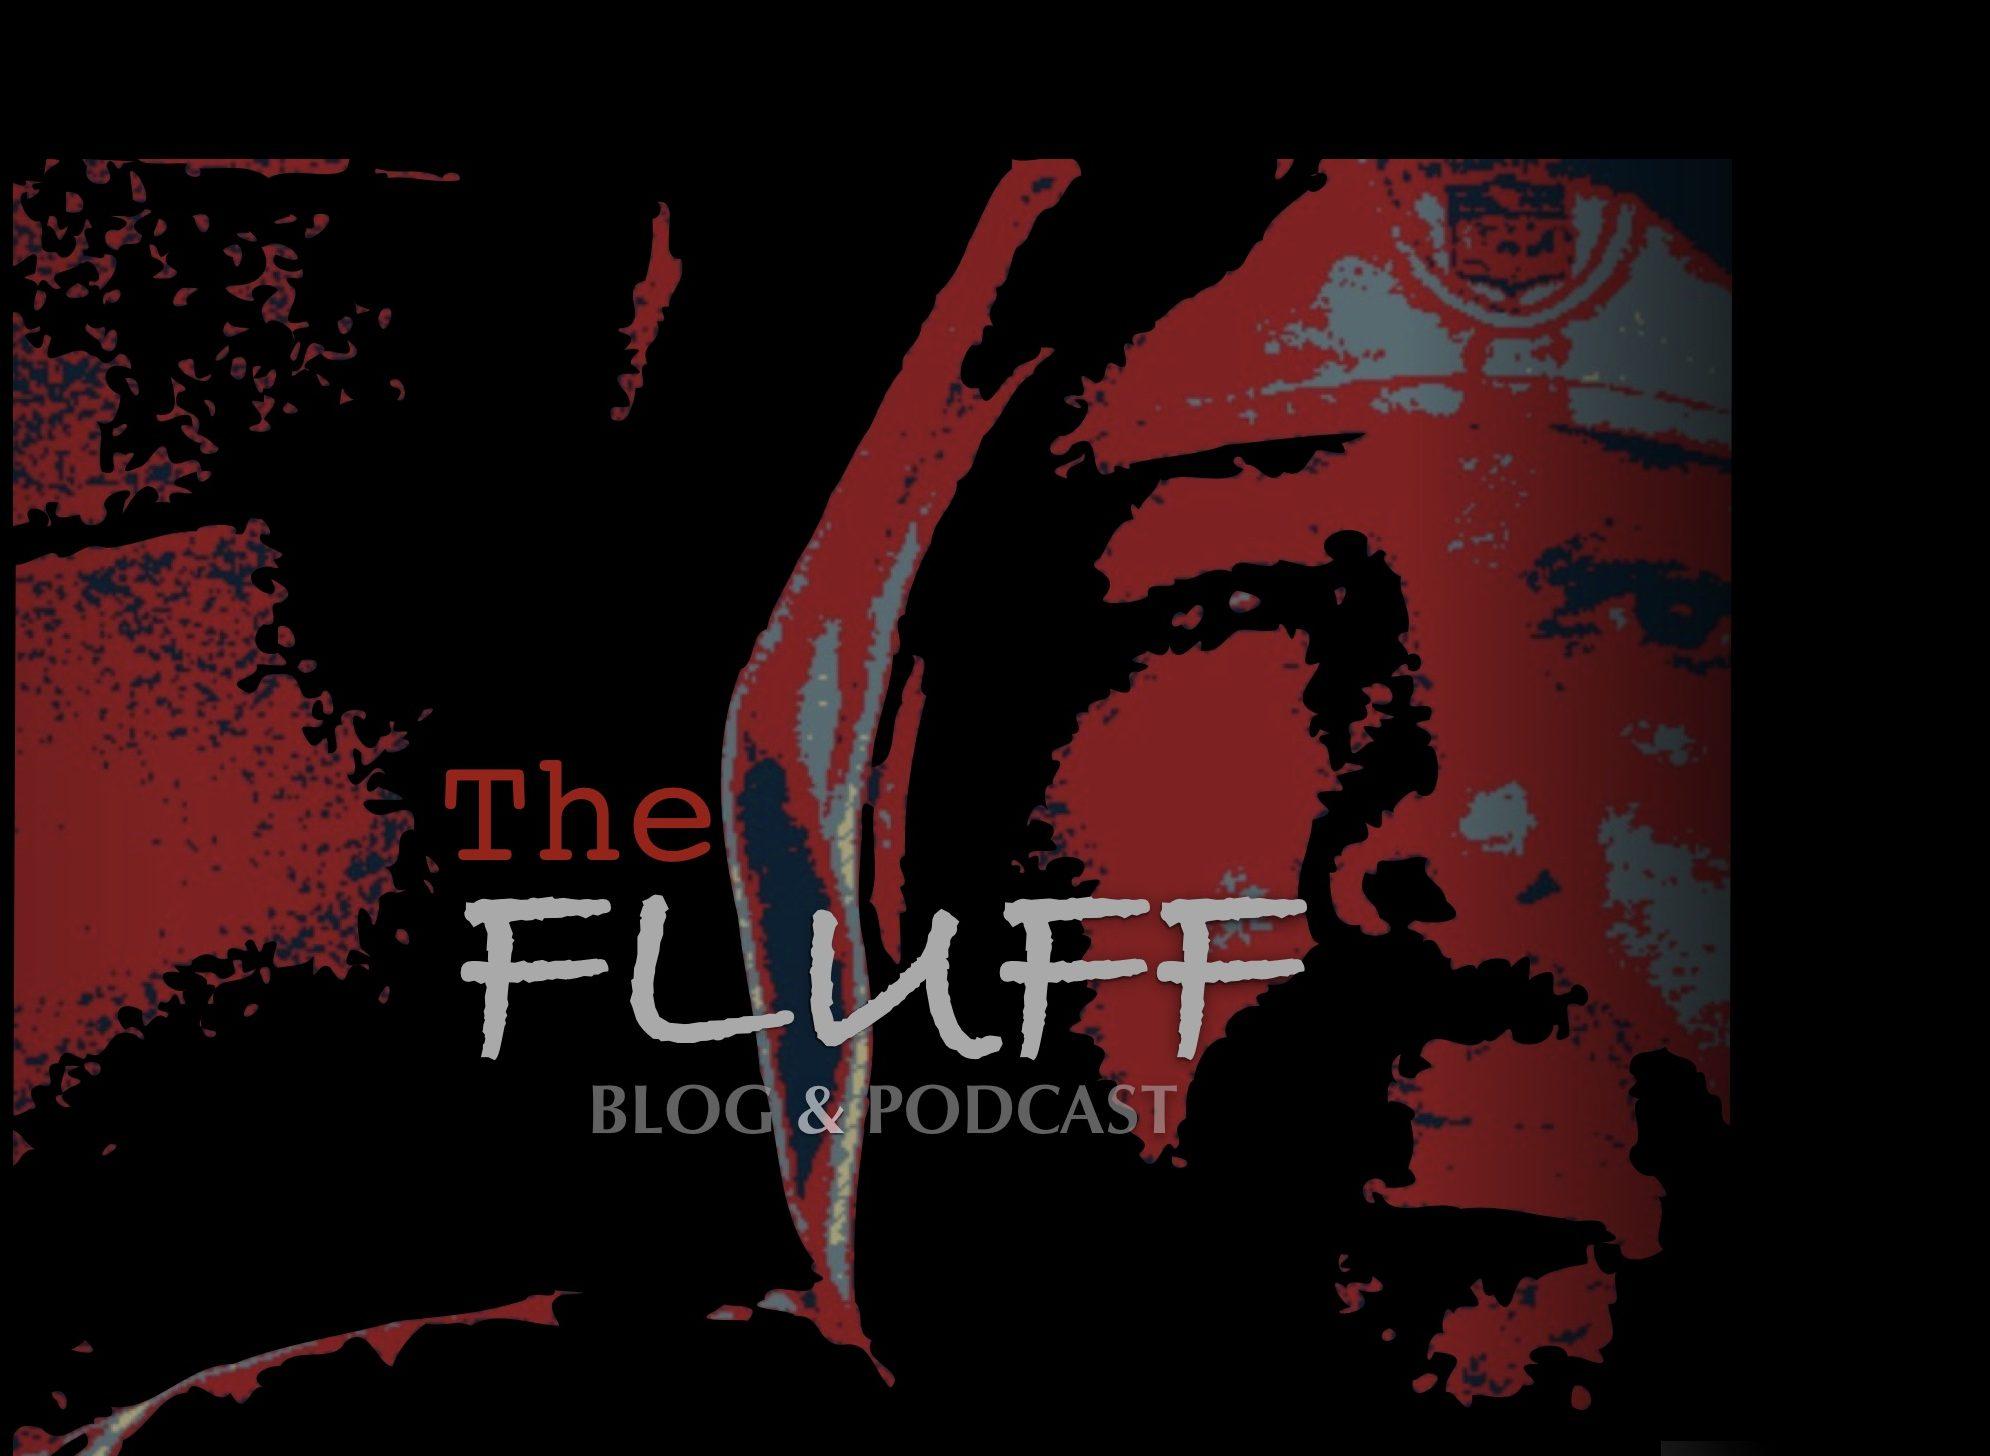 Blog + Podcast